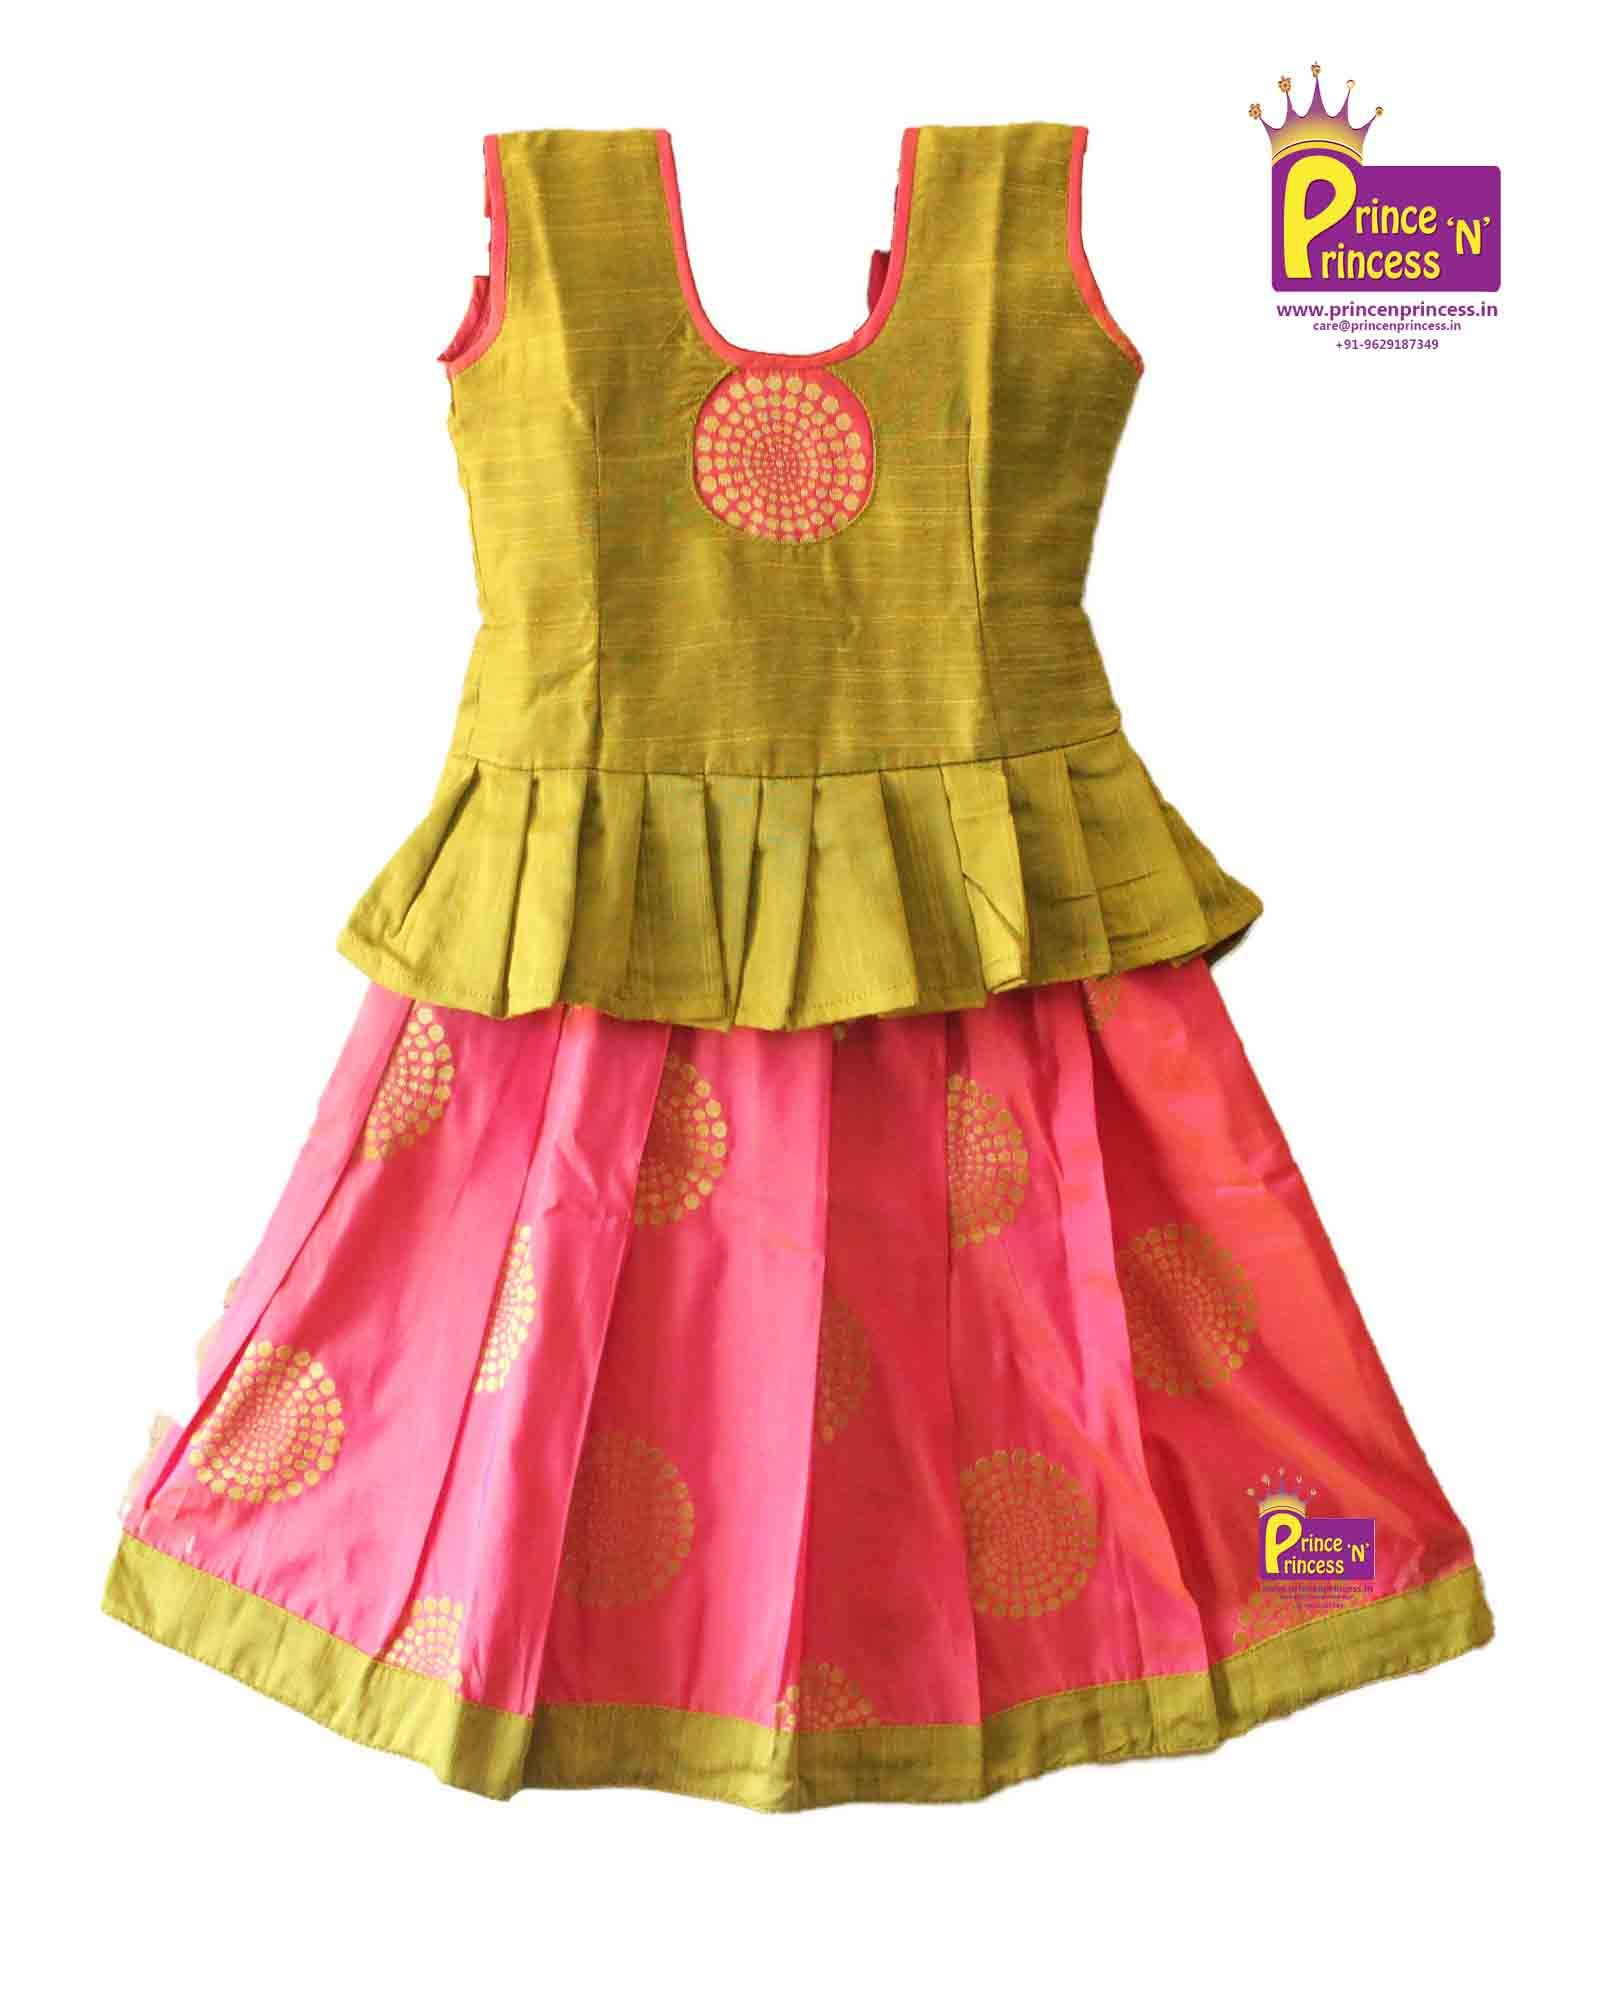 Designer Pink Green Frill Pavadai With Frills Grand Pavadai For Special Occasion Pattu Langa P Kids Blouse Designs Fancy Blouse Designs Kids Fashion Dress